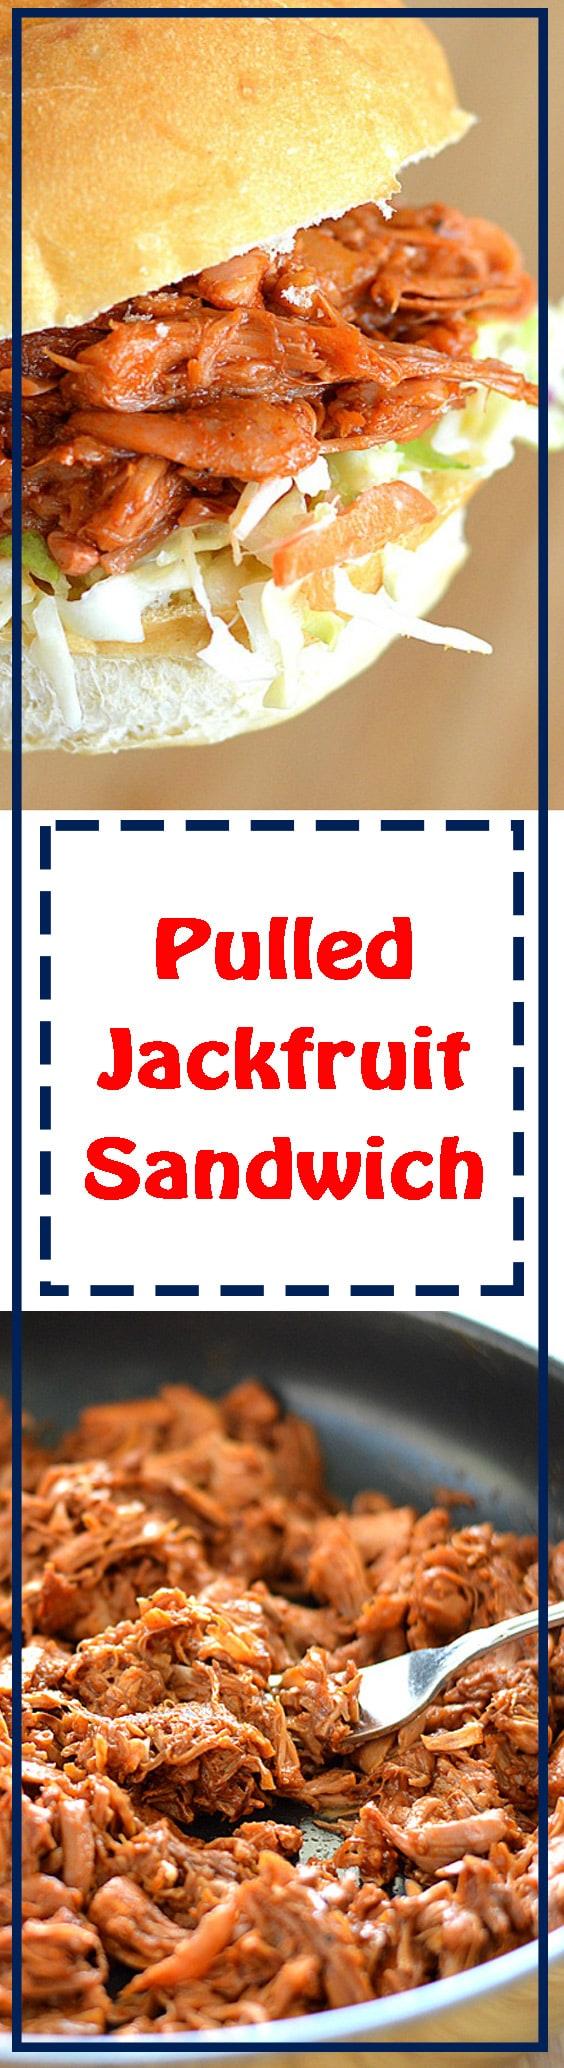 Pulled Jackfruit Sandwiches